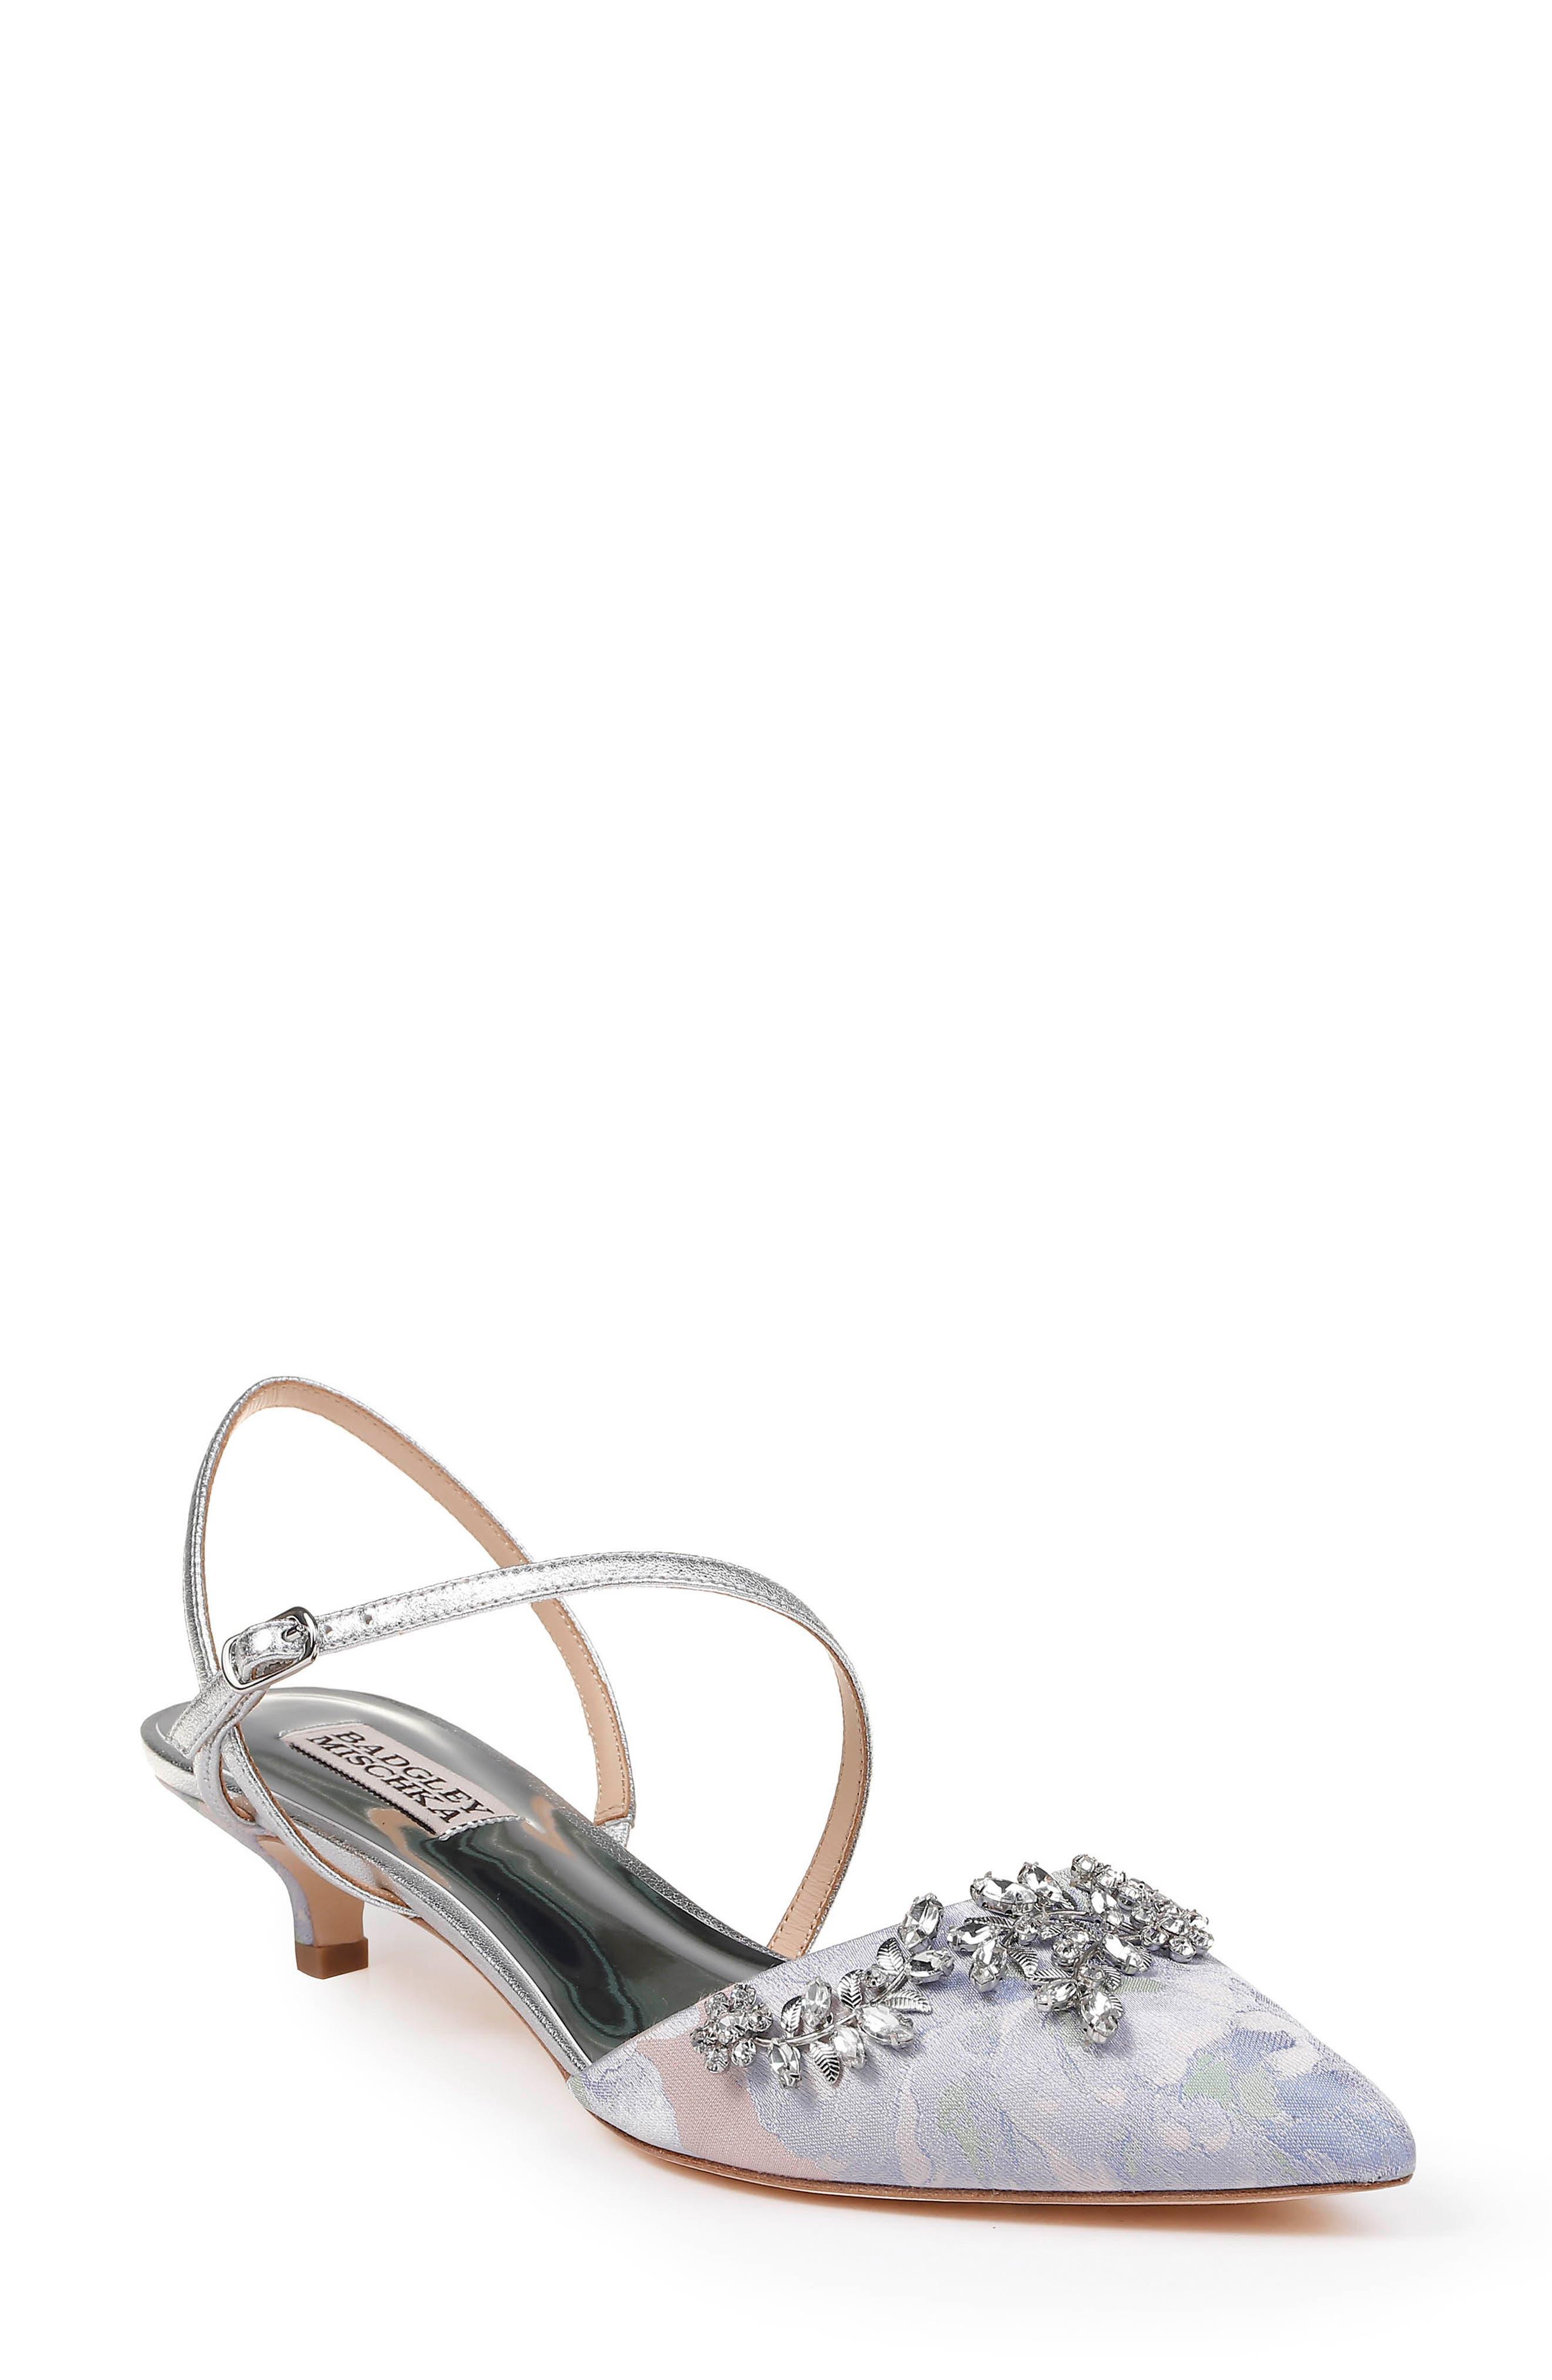 Badgley Mischka Crystal Embellished Quarter Strap Pump, Metallic